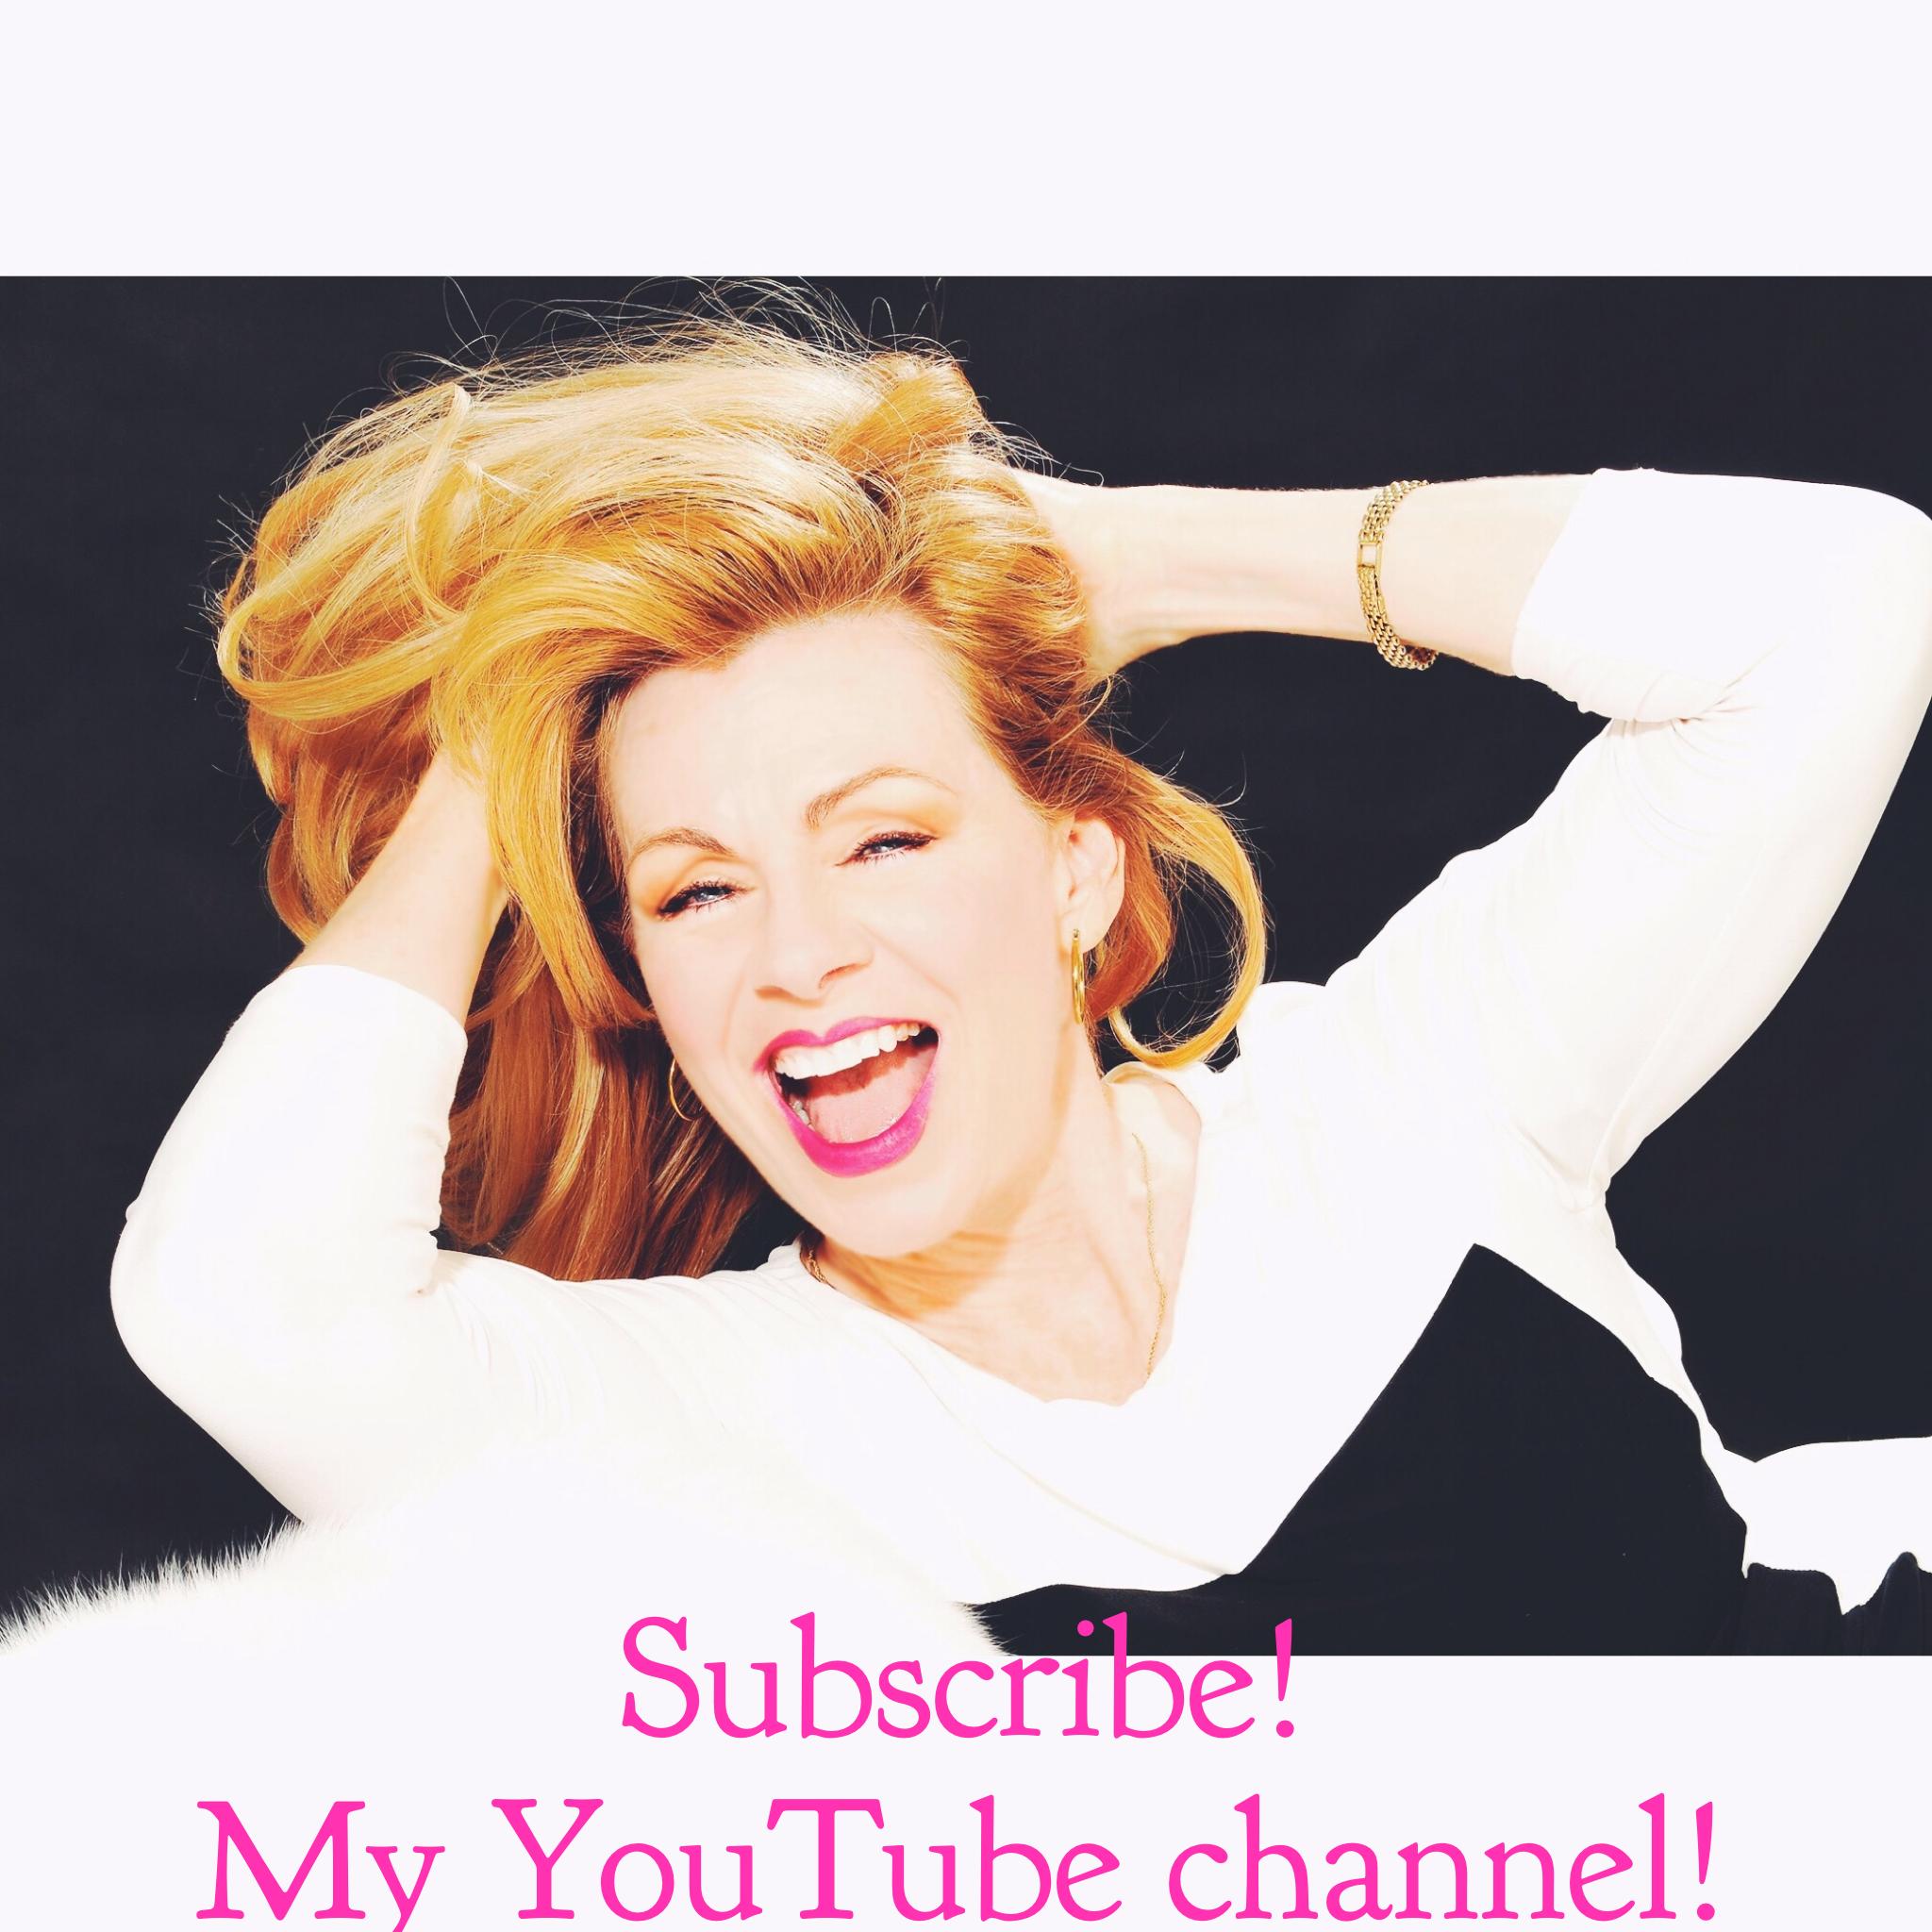 SubscribeYouTube